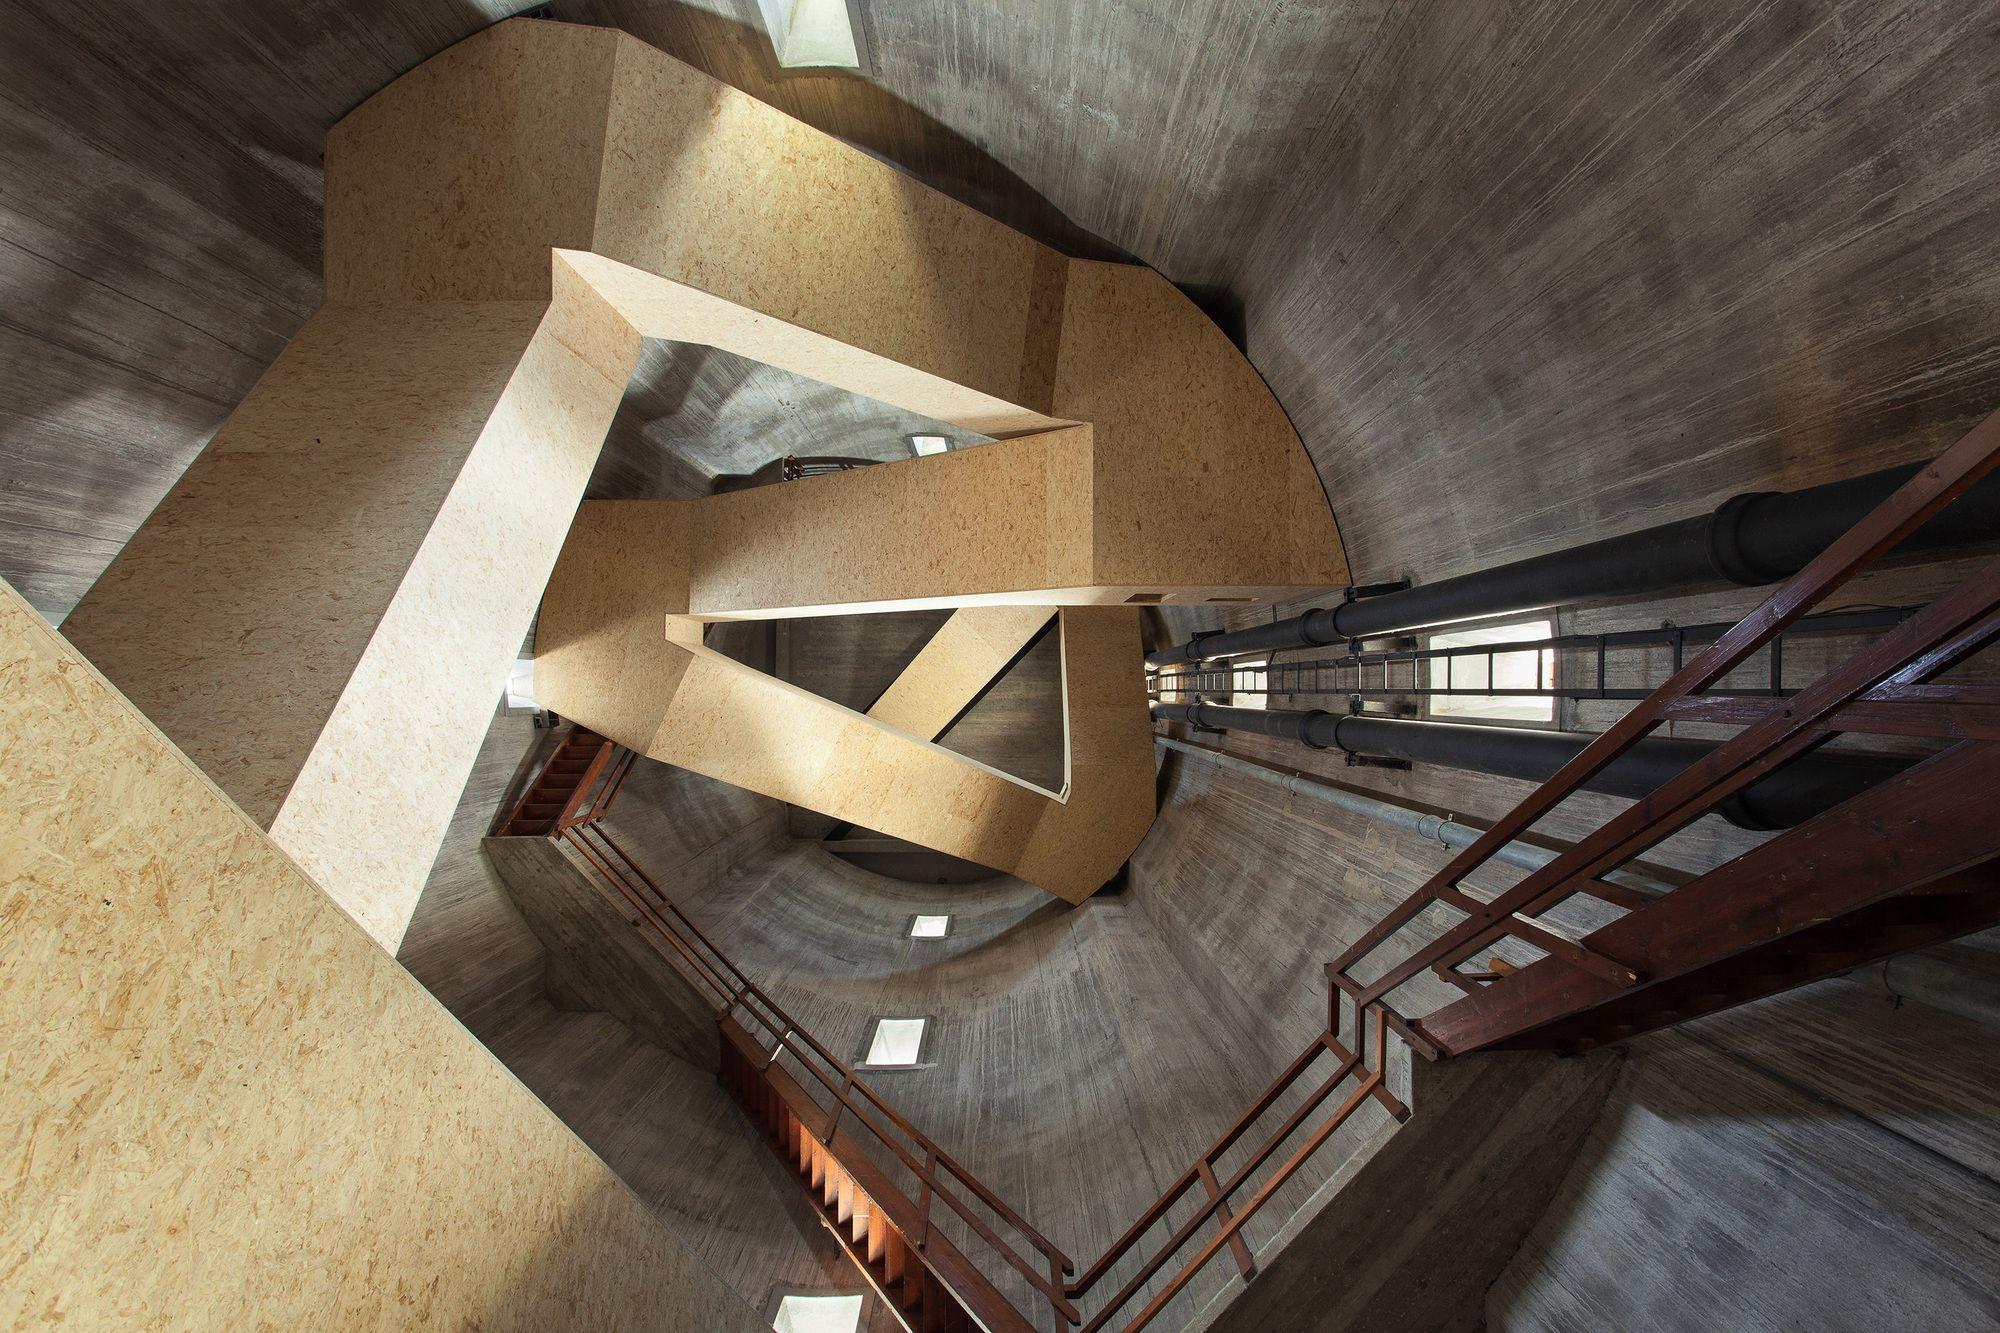 Torre de Vigilância e de Água Sint Jansklooster / Zecc Architecten © Stijn Poelstra